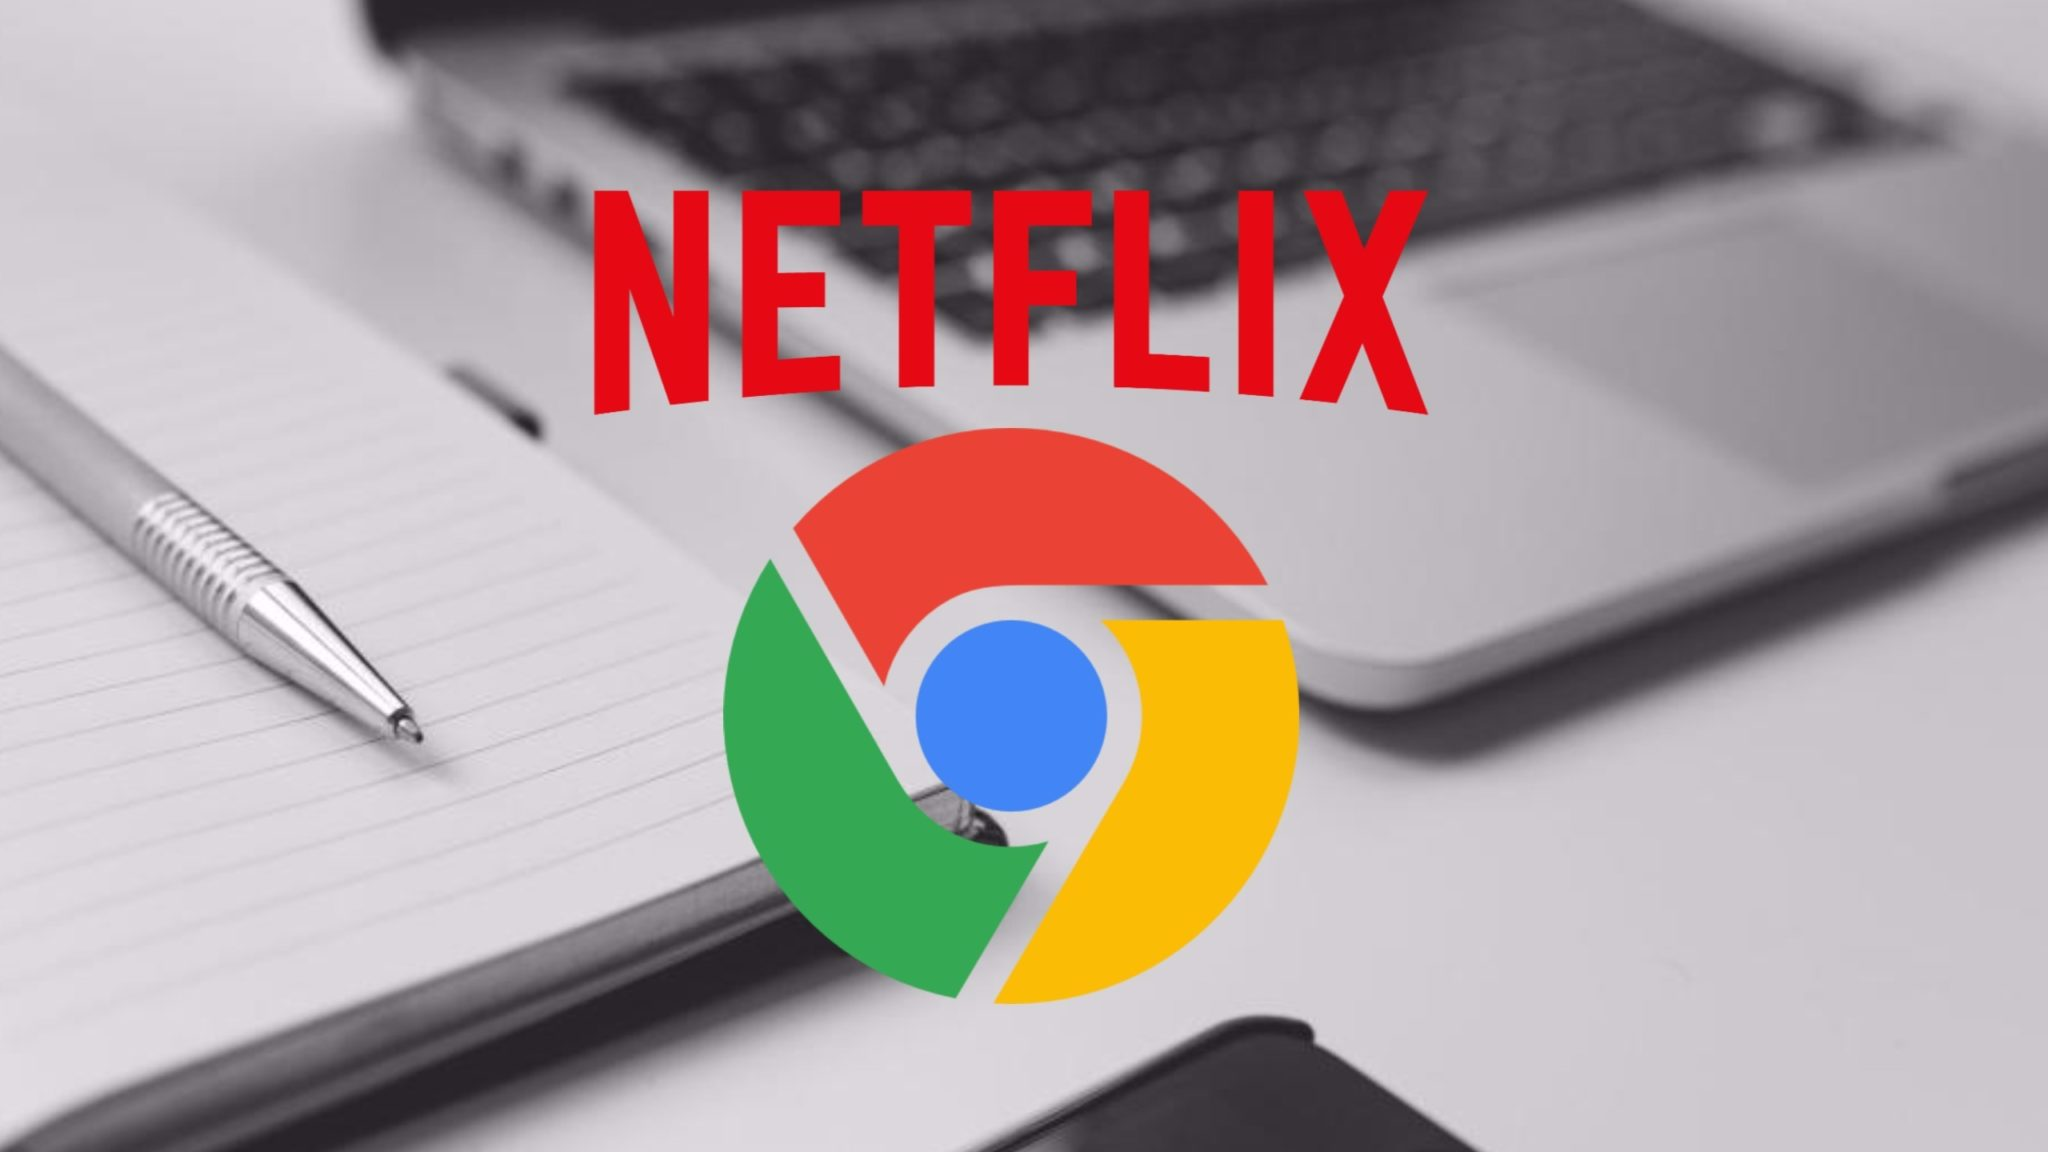 how to go to netflix on google chrome